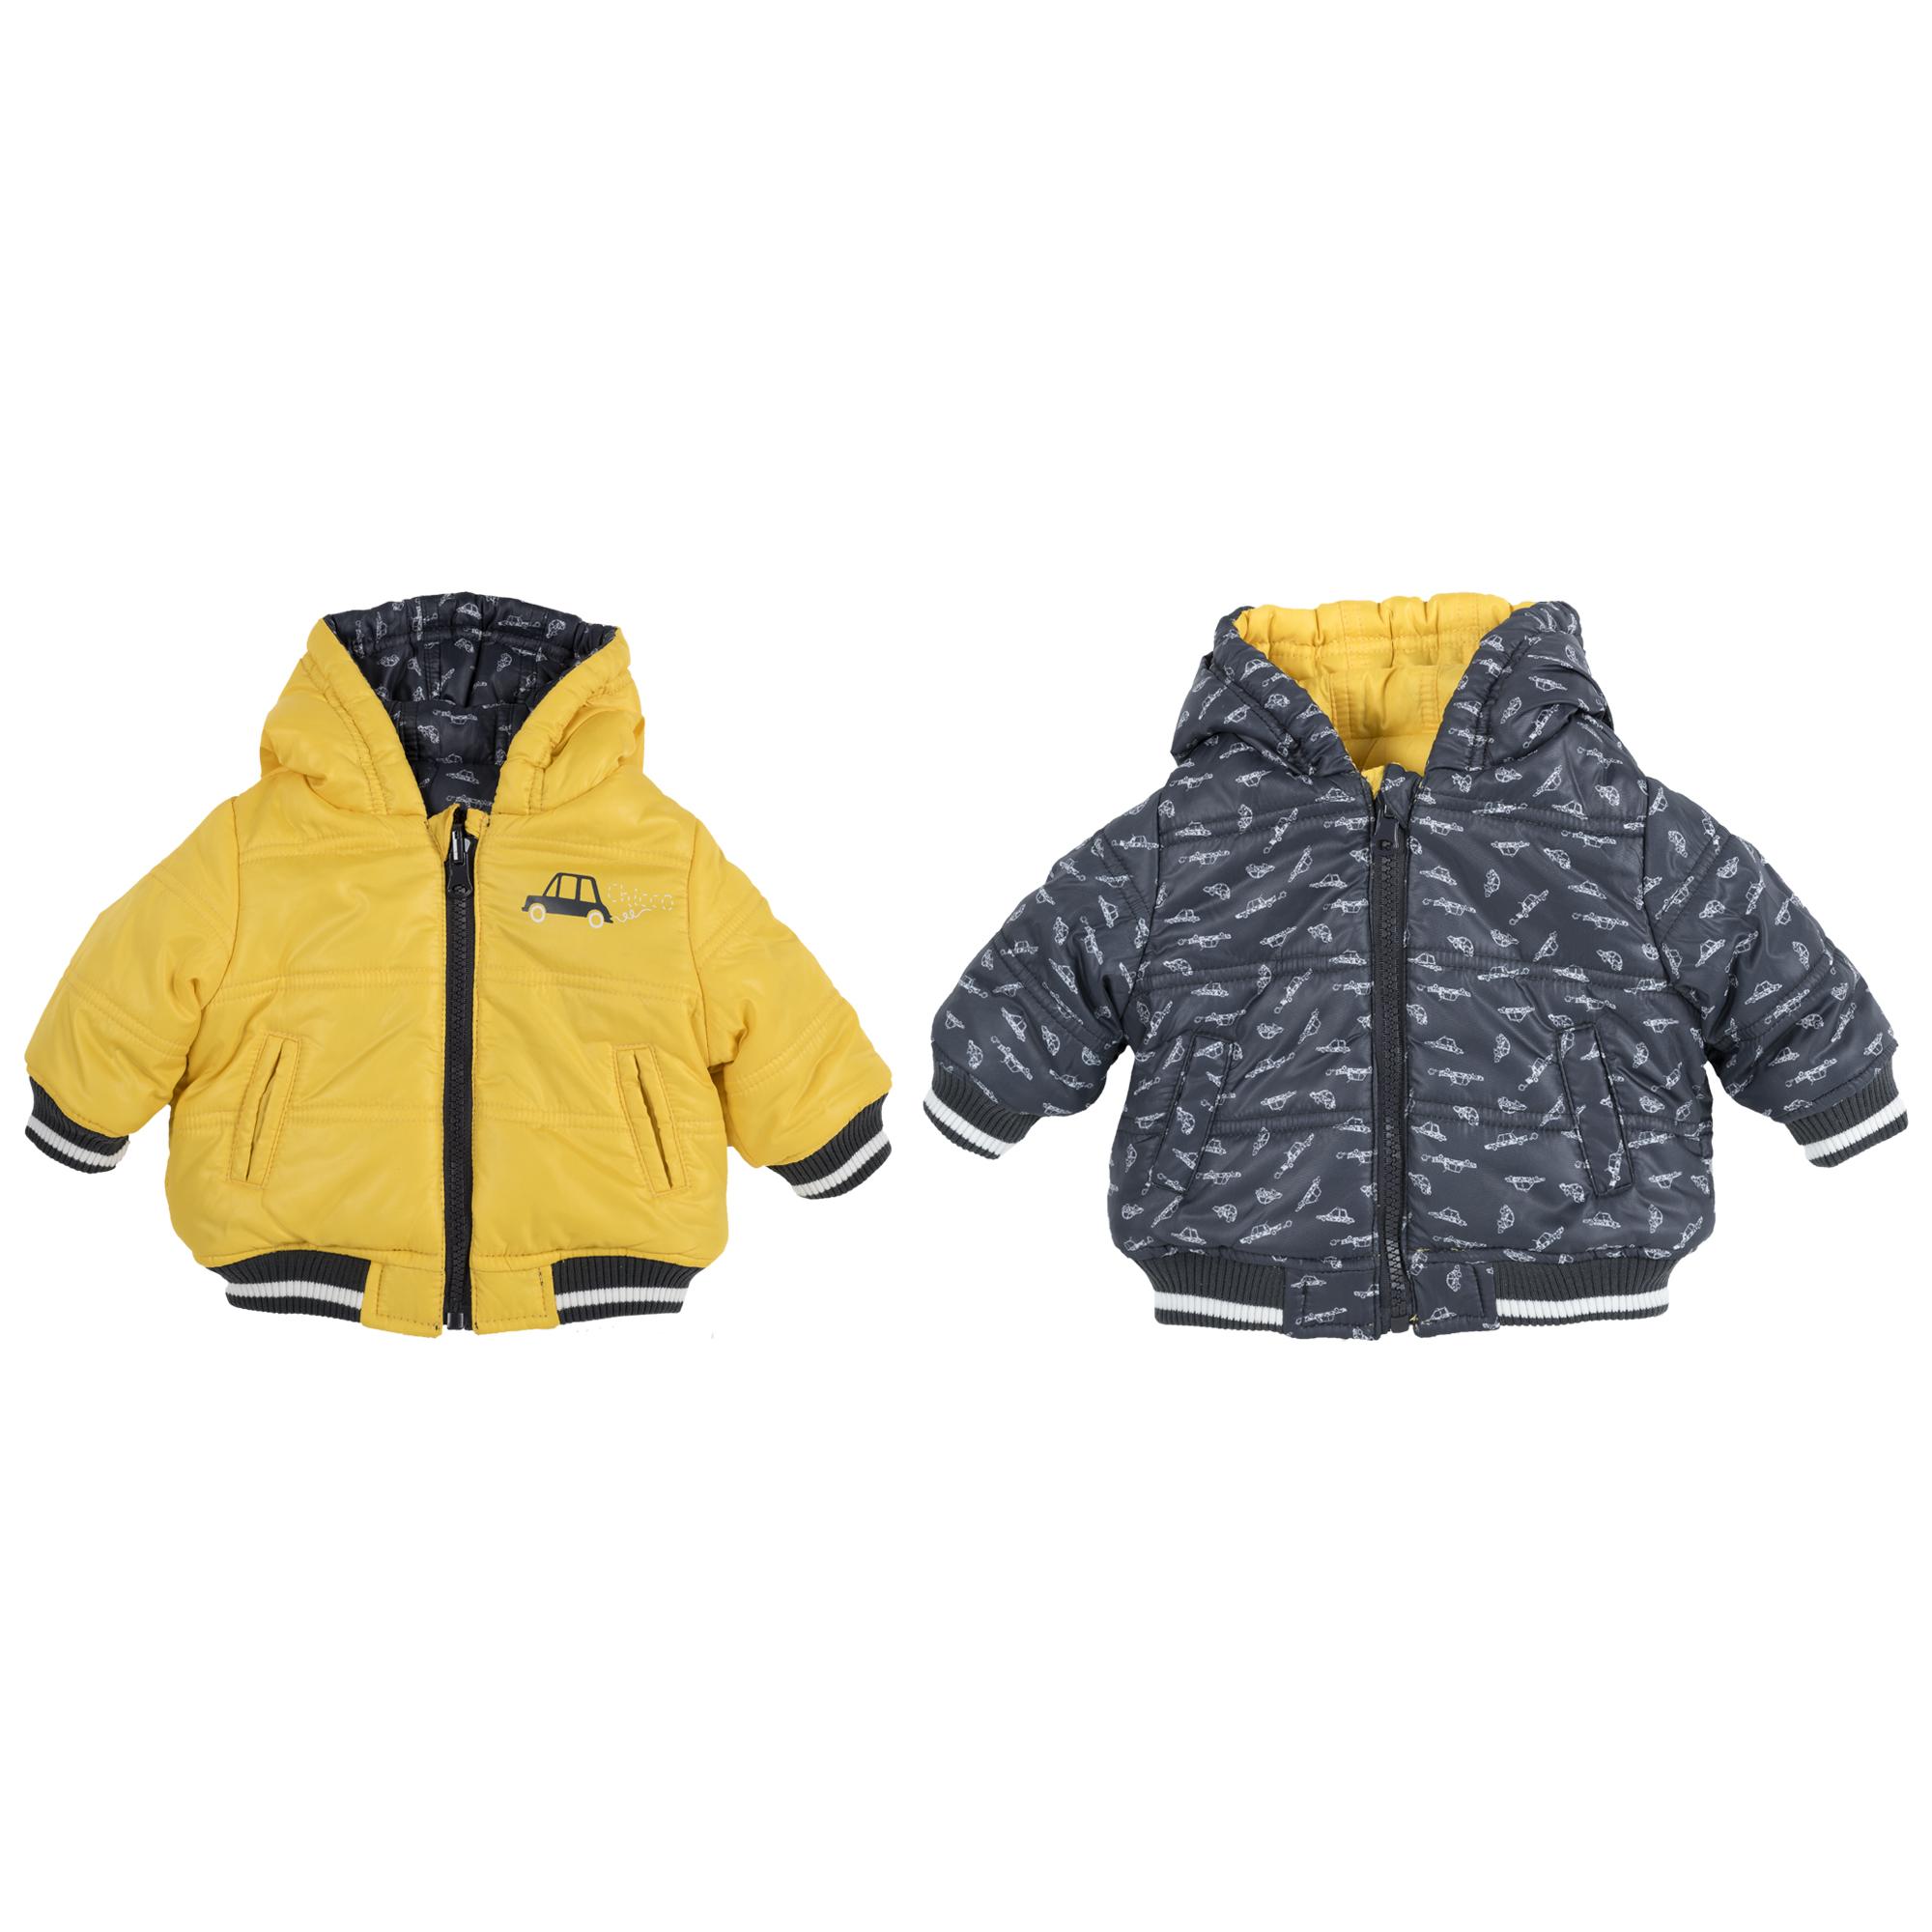 Jacheta reversibila copii Chicco, galben auriu